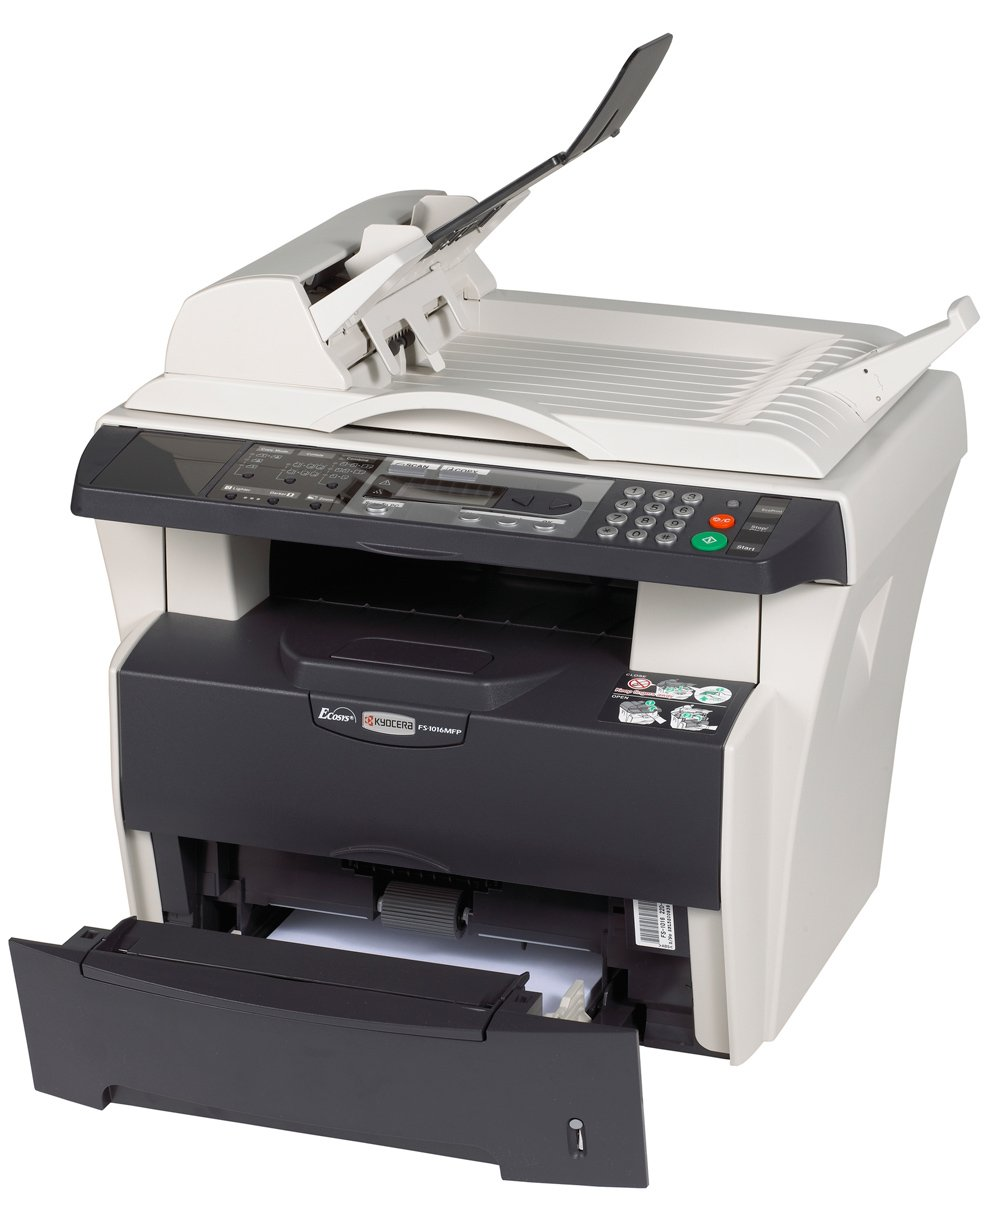 pilote imprimante kyocera fs-1016mfp